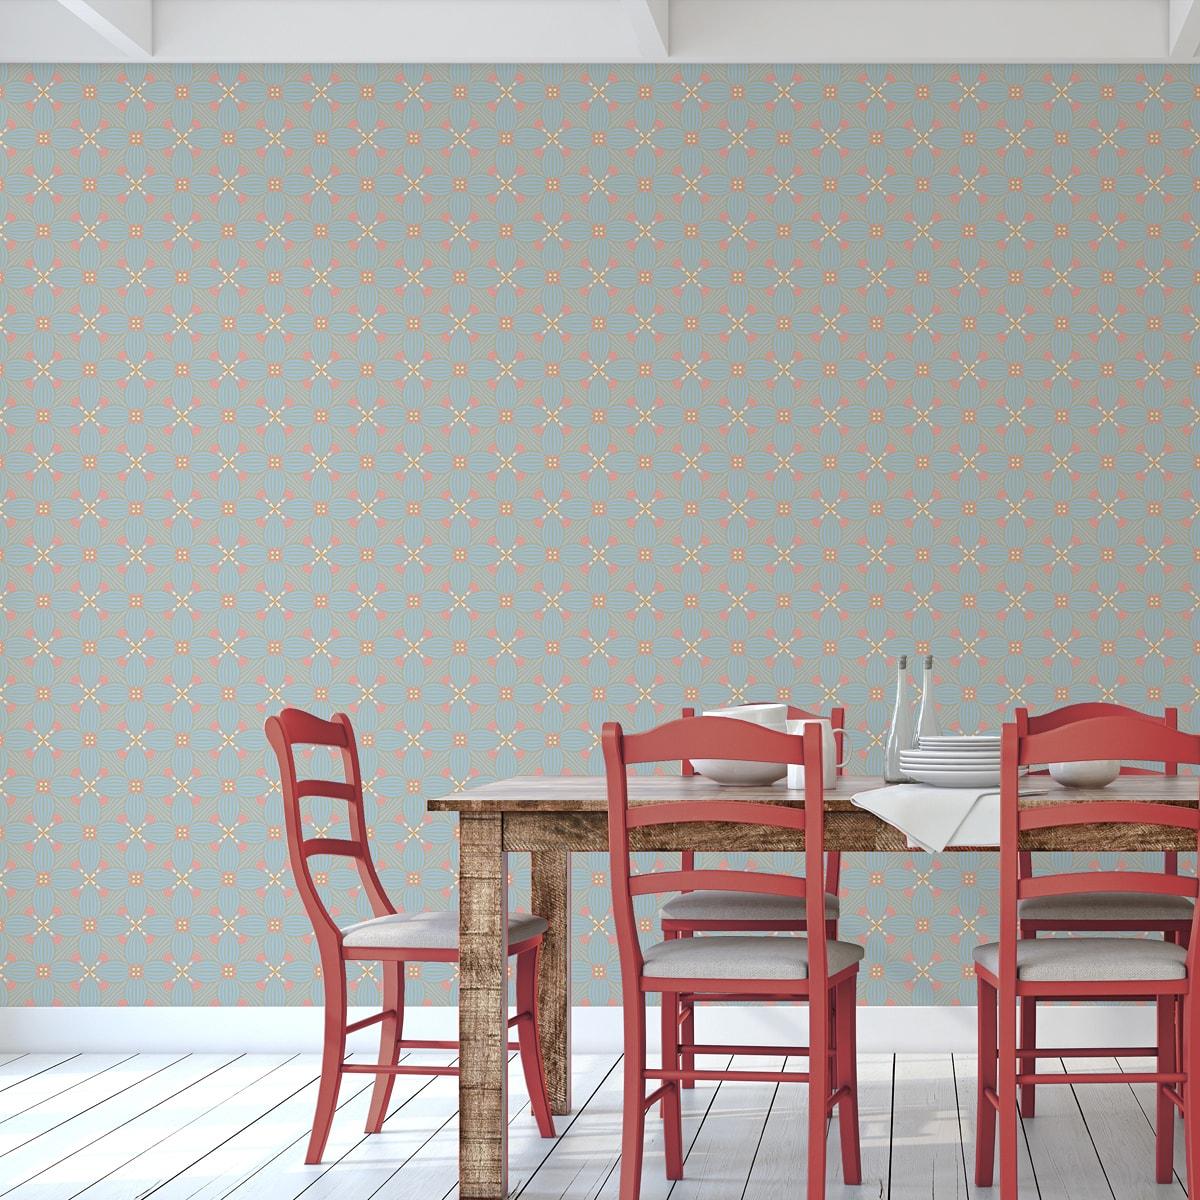 Wandtapete rosa: Lilly Ornamenttapete Art Deko Muster groß in pastell blau, Design Tapete als Wandgestaltung